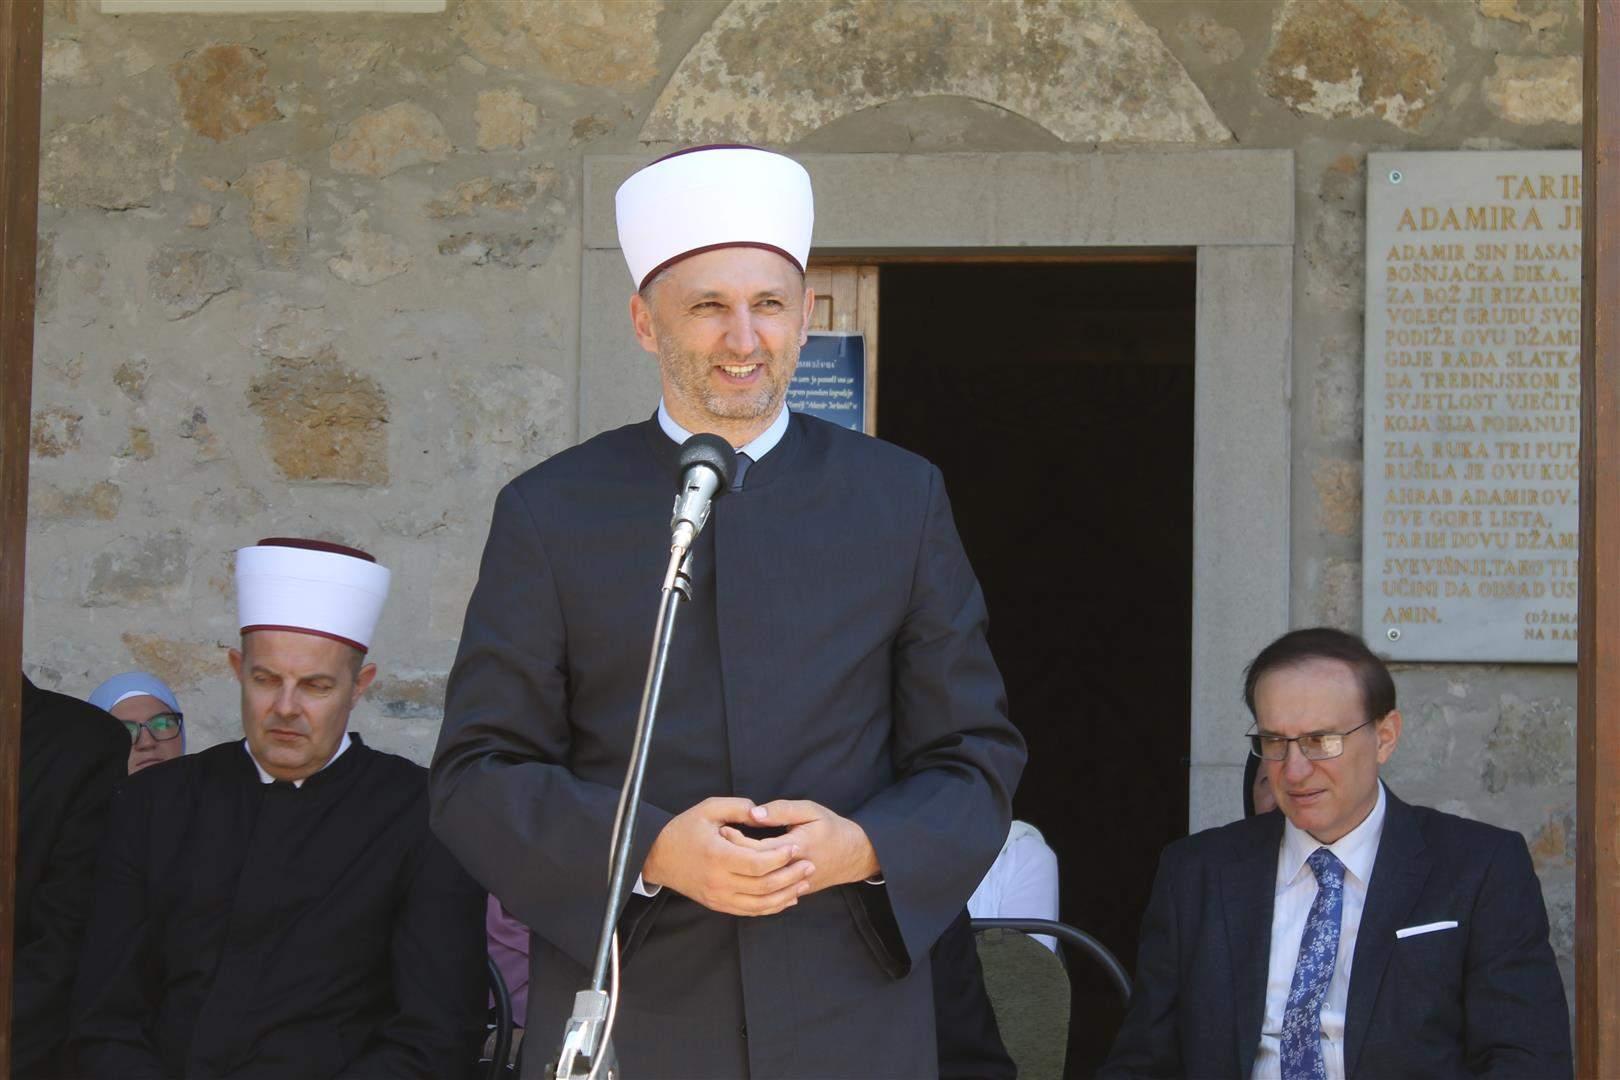 IMG_2605.JPG - Mevludskim programom obilježena izgradnja munare na džamiji